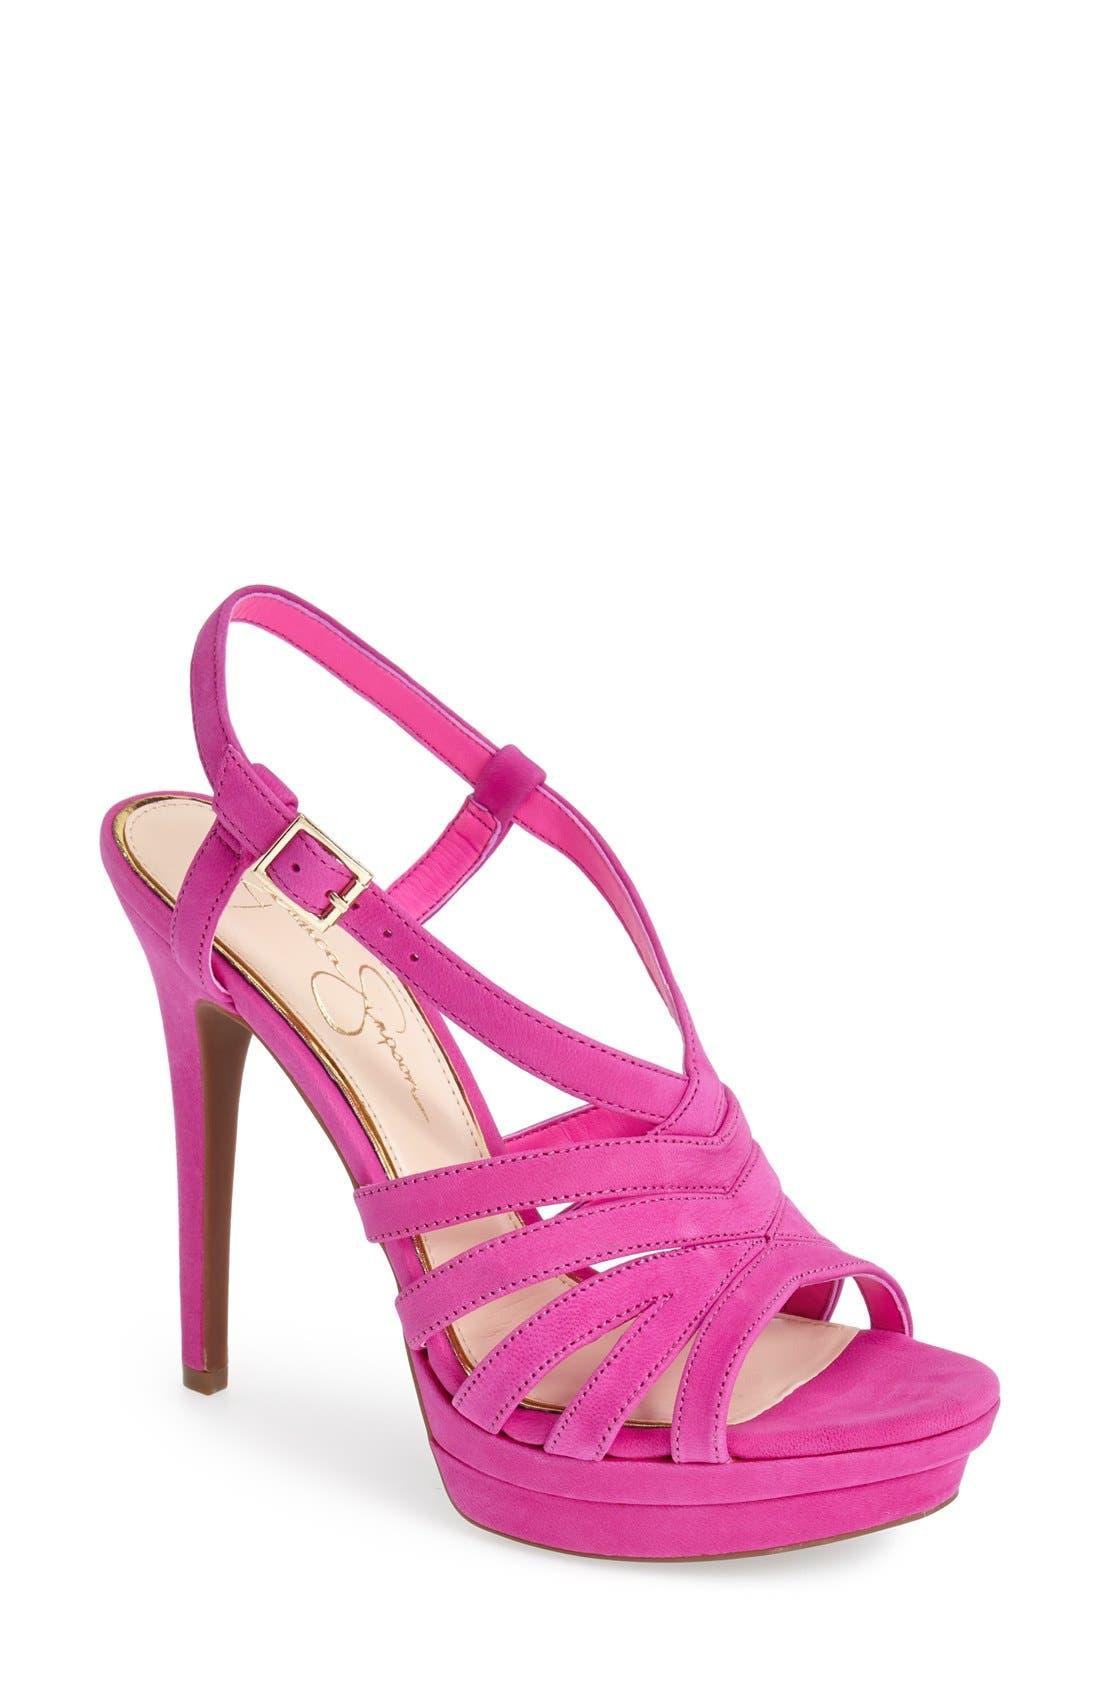 Alternate Image 1 Selected - Jessica Simpson 'Peace' Suede Peep Toe Platform Sandal (Women)